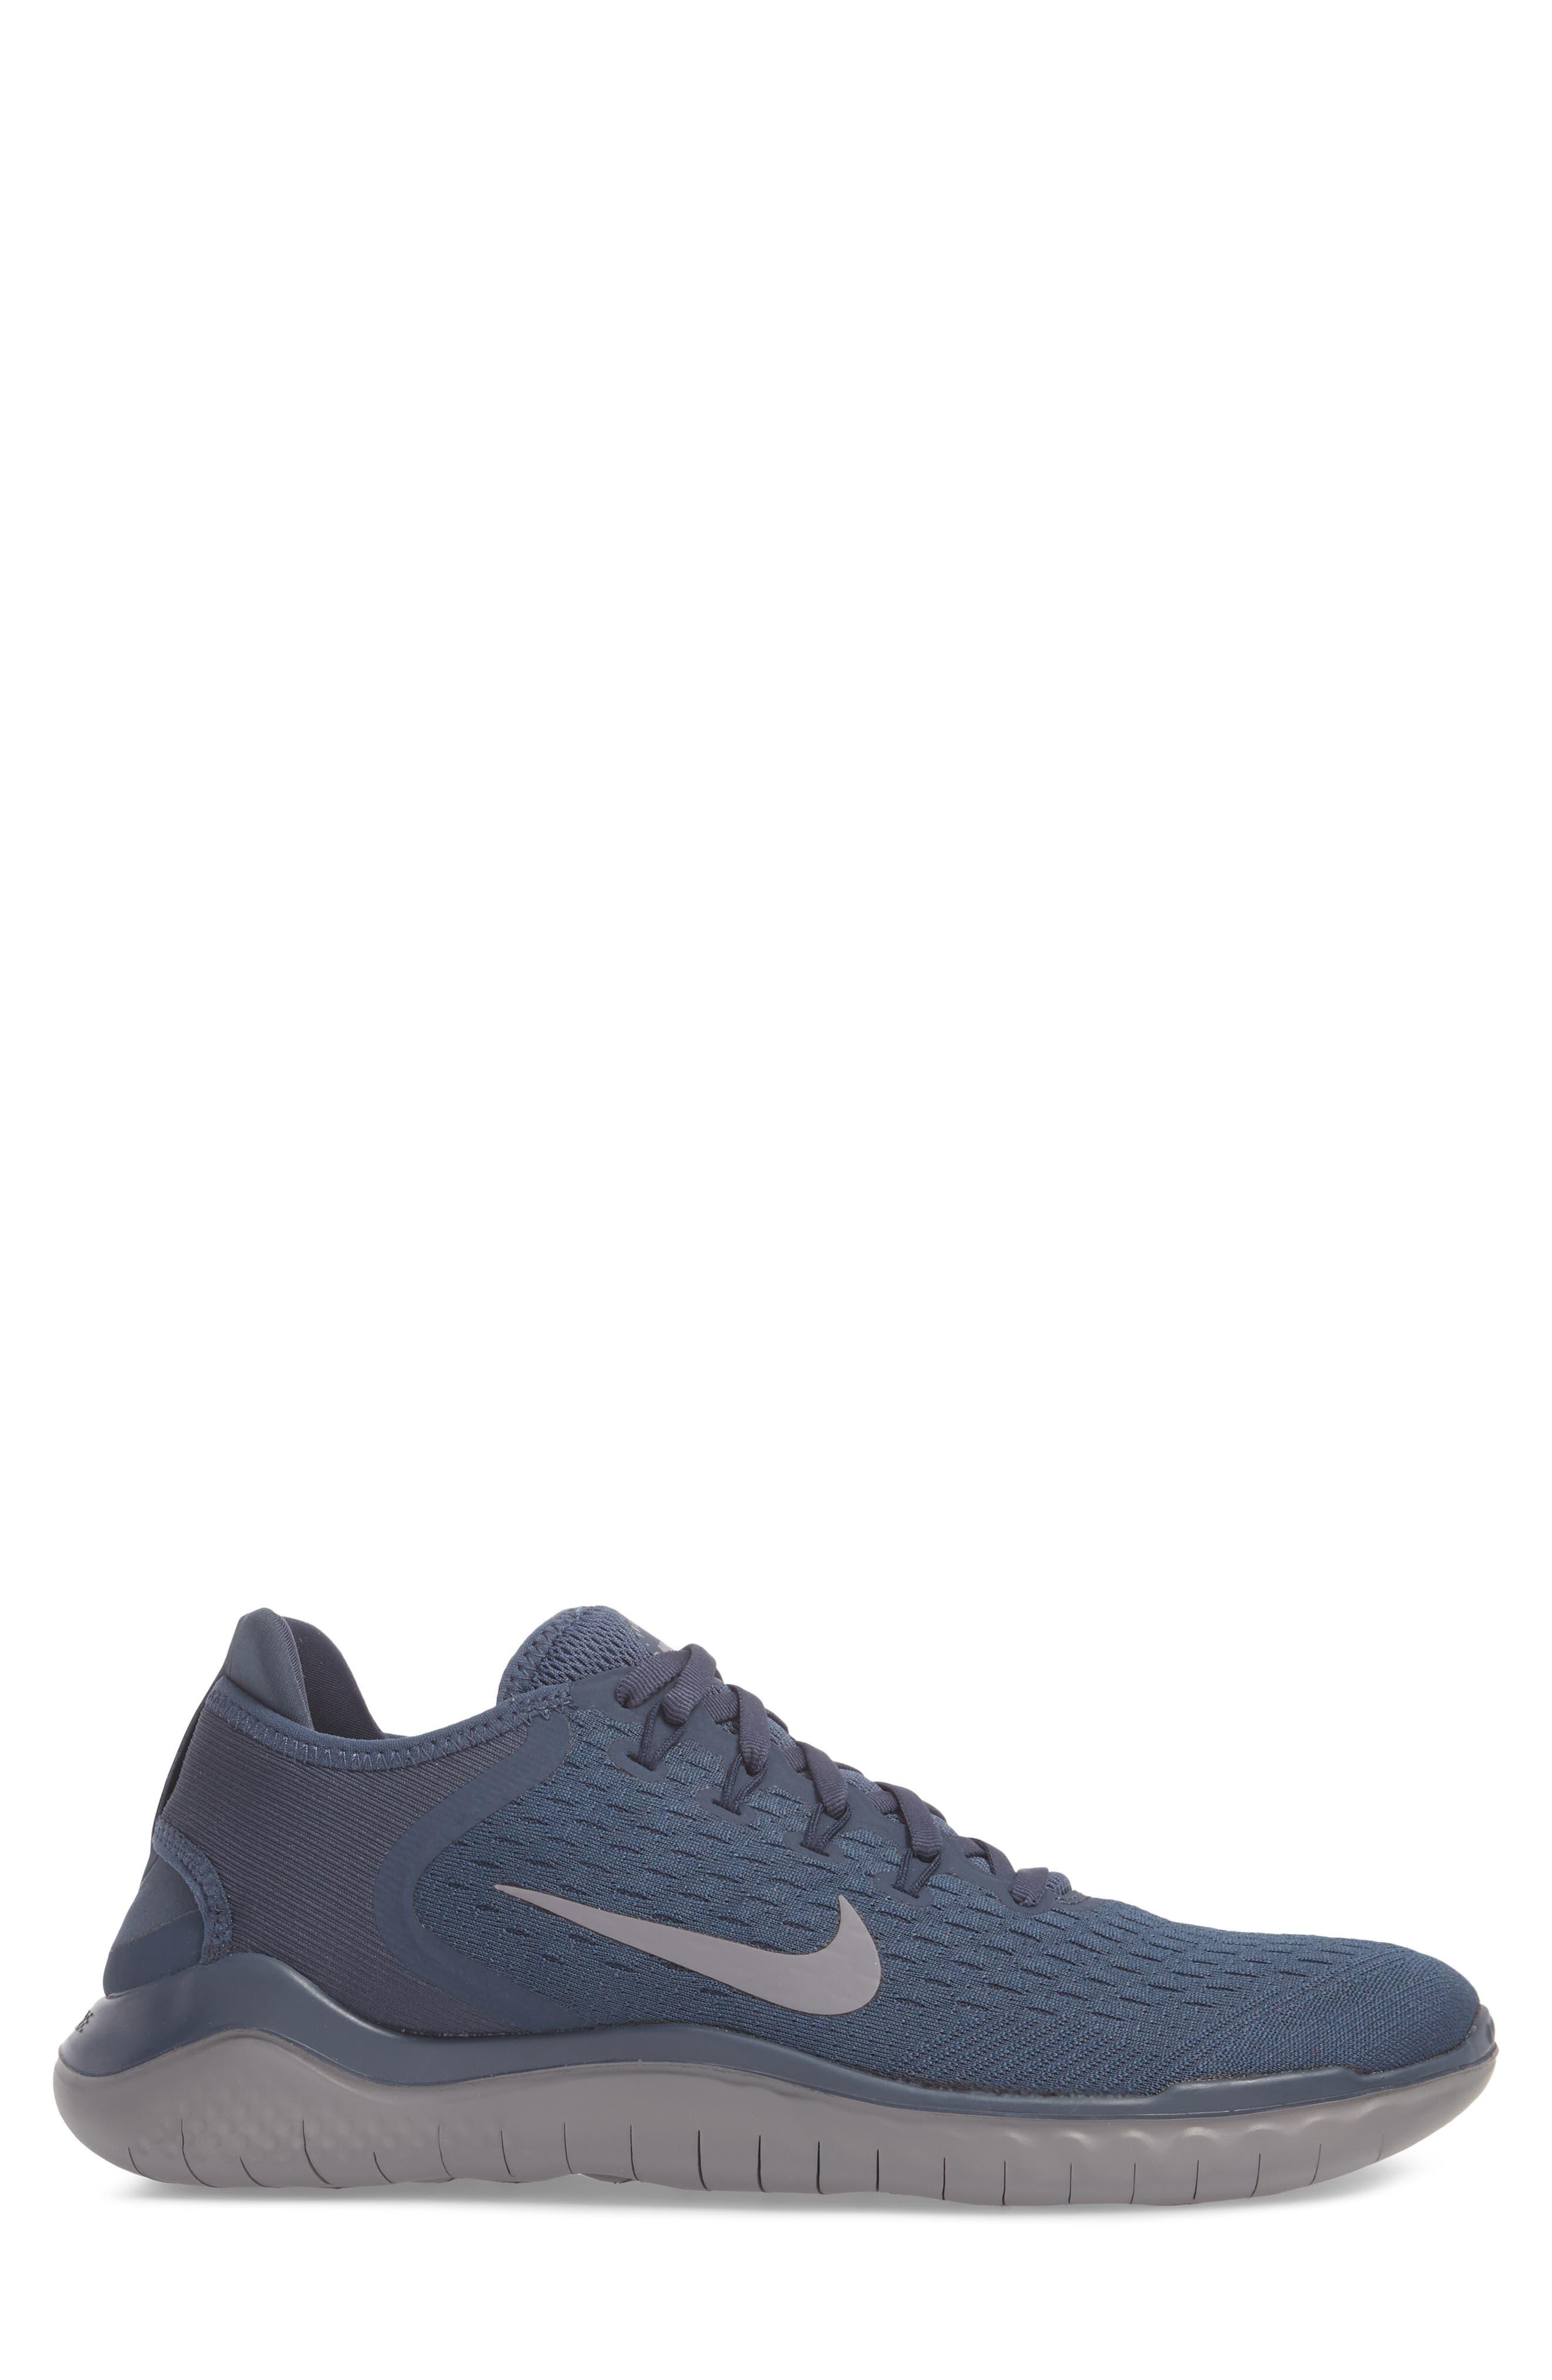 Free RN 2018 Running Shoe,                             Alternate thumbnail 3, color,                             THUNDER BLUE/ SMOKE